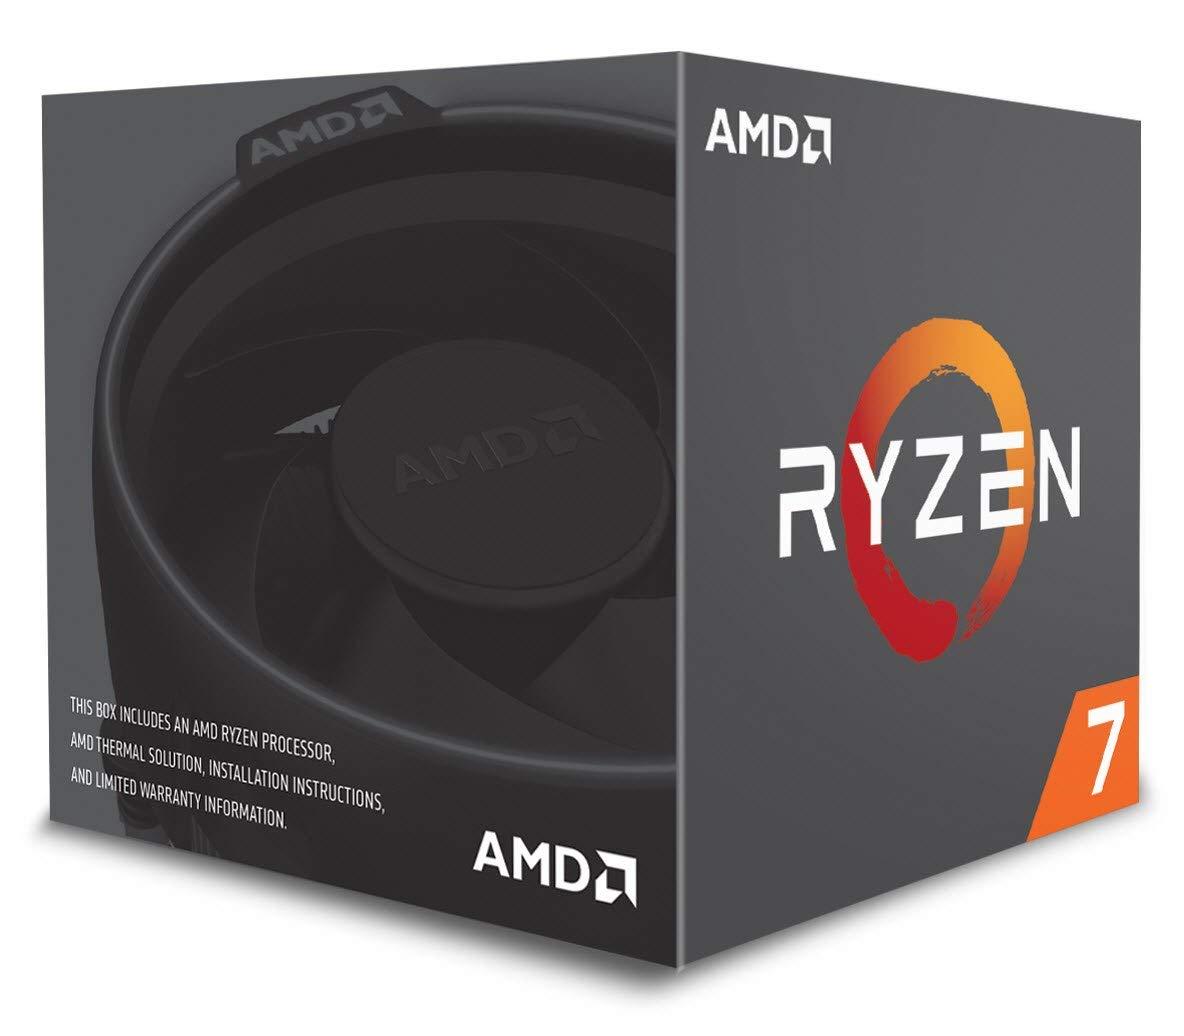 AMD Ryzen 7 2700 - Processor with Wraith Spire LED heatsink (20 MB, 8 cores, 4.1GhZ, 65 W) £186.79 Fee Free card or £195 @ Amazon IT